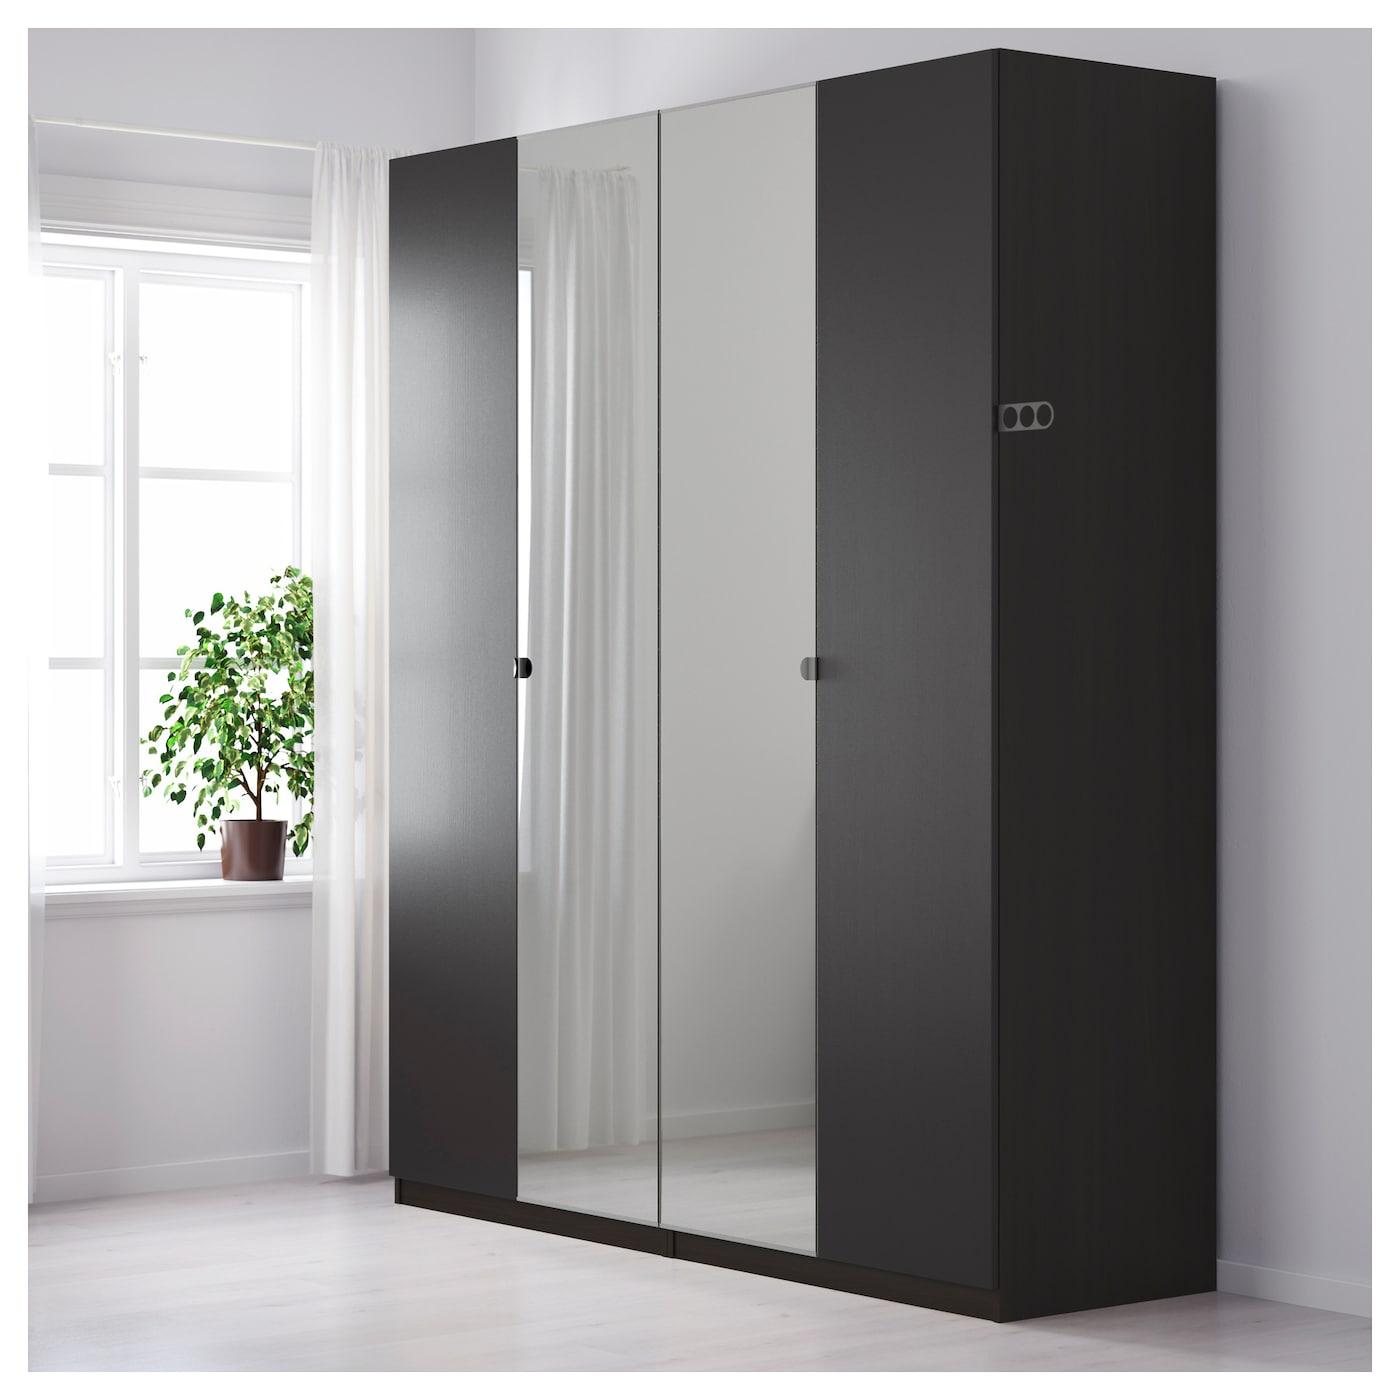 pax wardrobe black brown nexus vikedal 200x60x236 cm   ikea